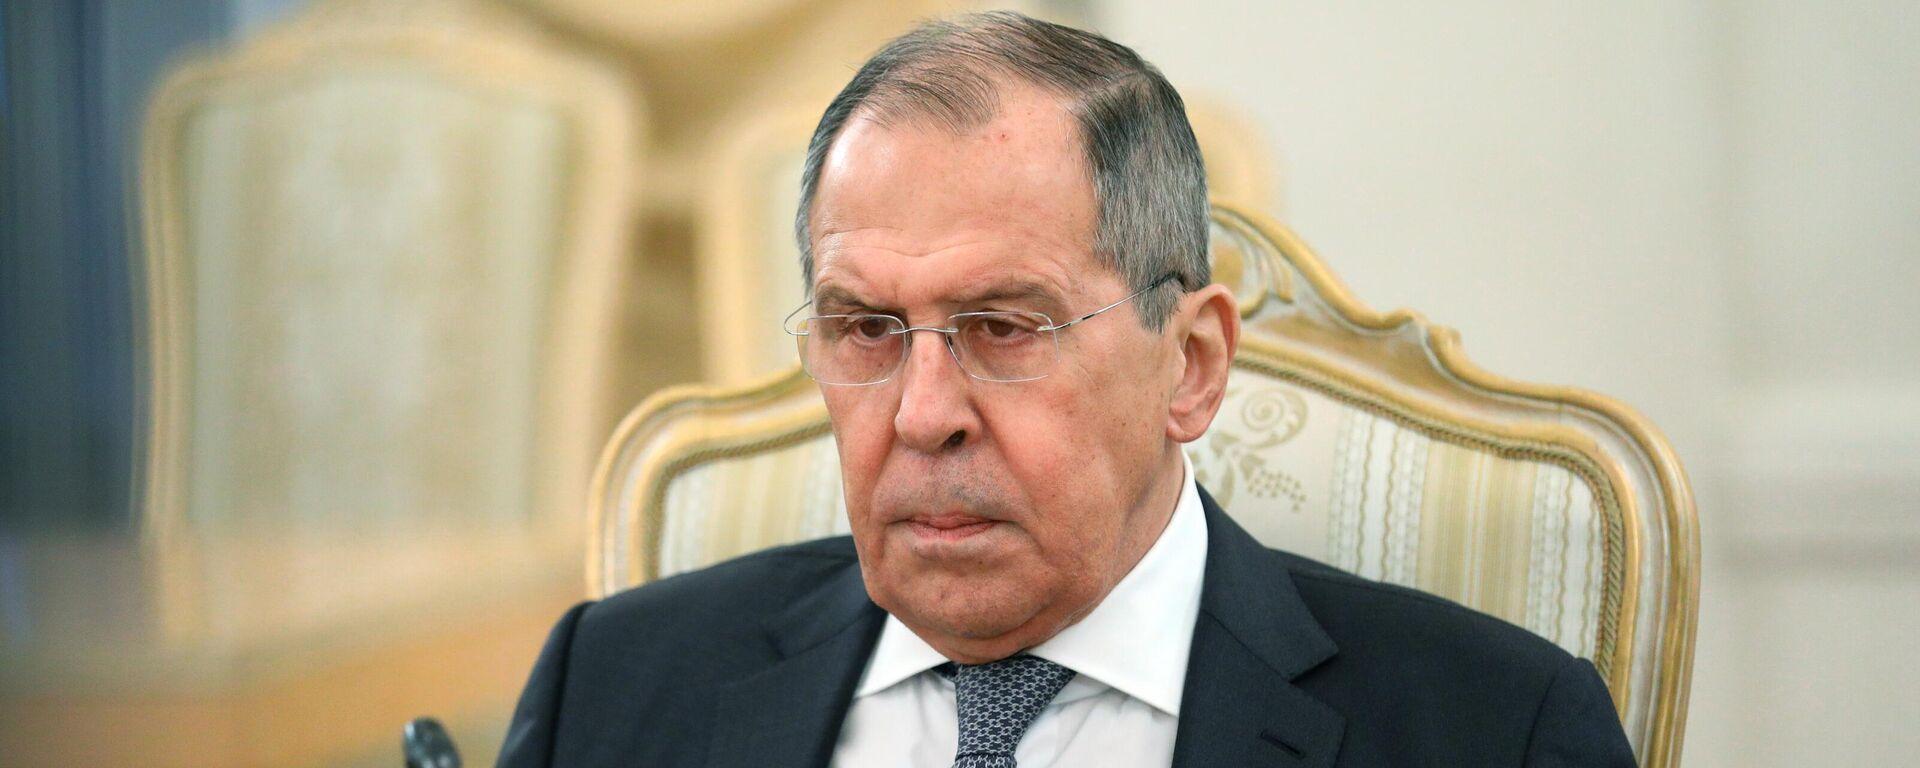 Serguéi Lavrov, canciller de Rusia - Sputnik Mundo, 1920, 09.06.2021